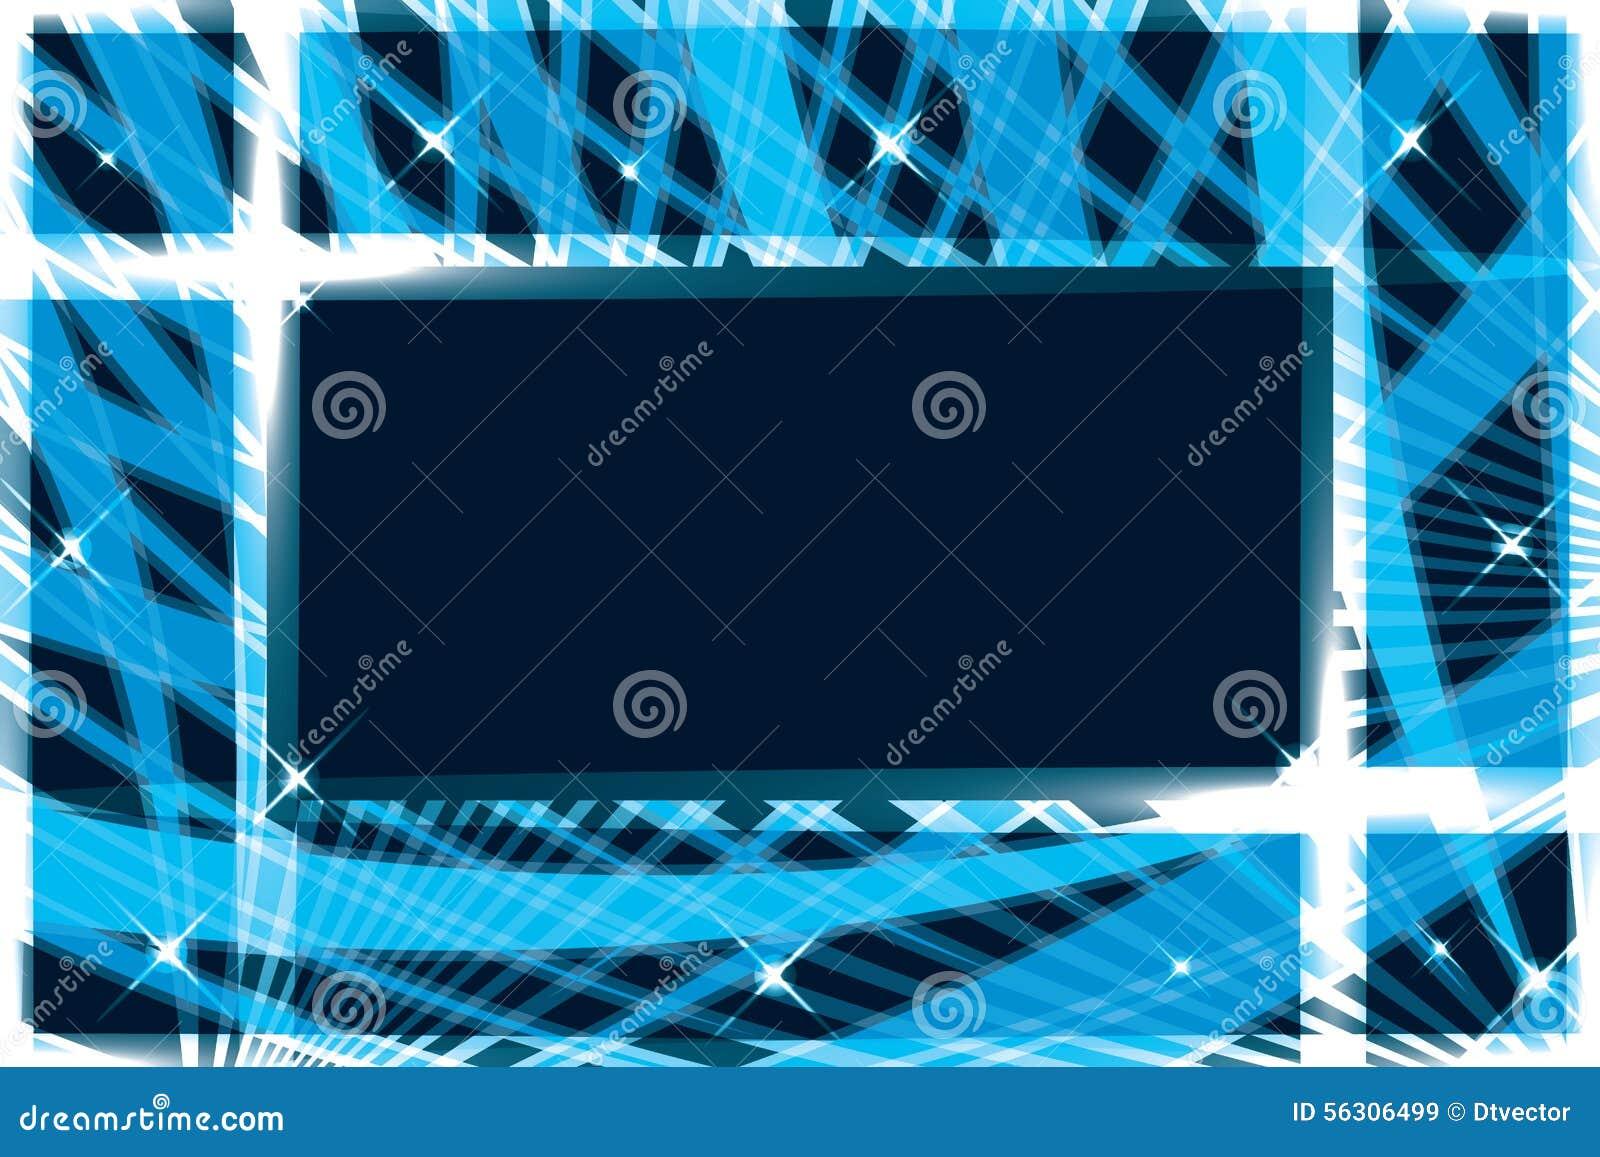 Line rectangle frame banner card stock vector image for Bright lights design center